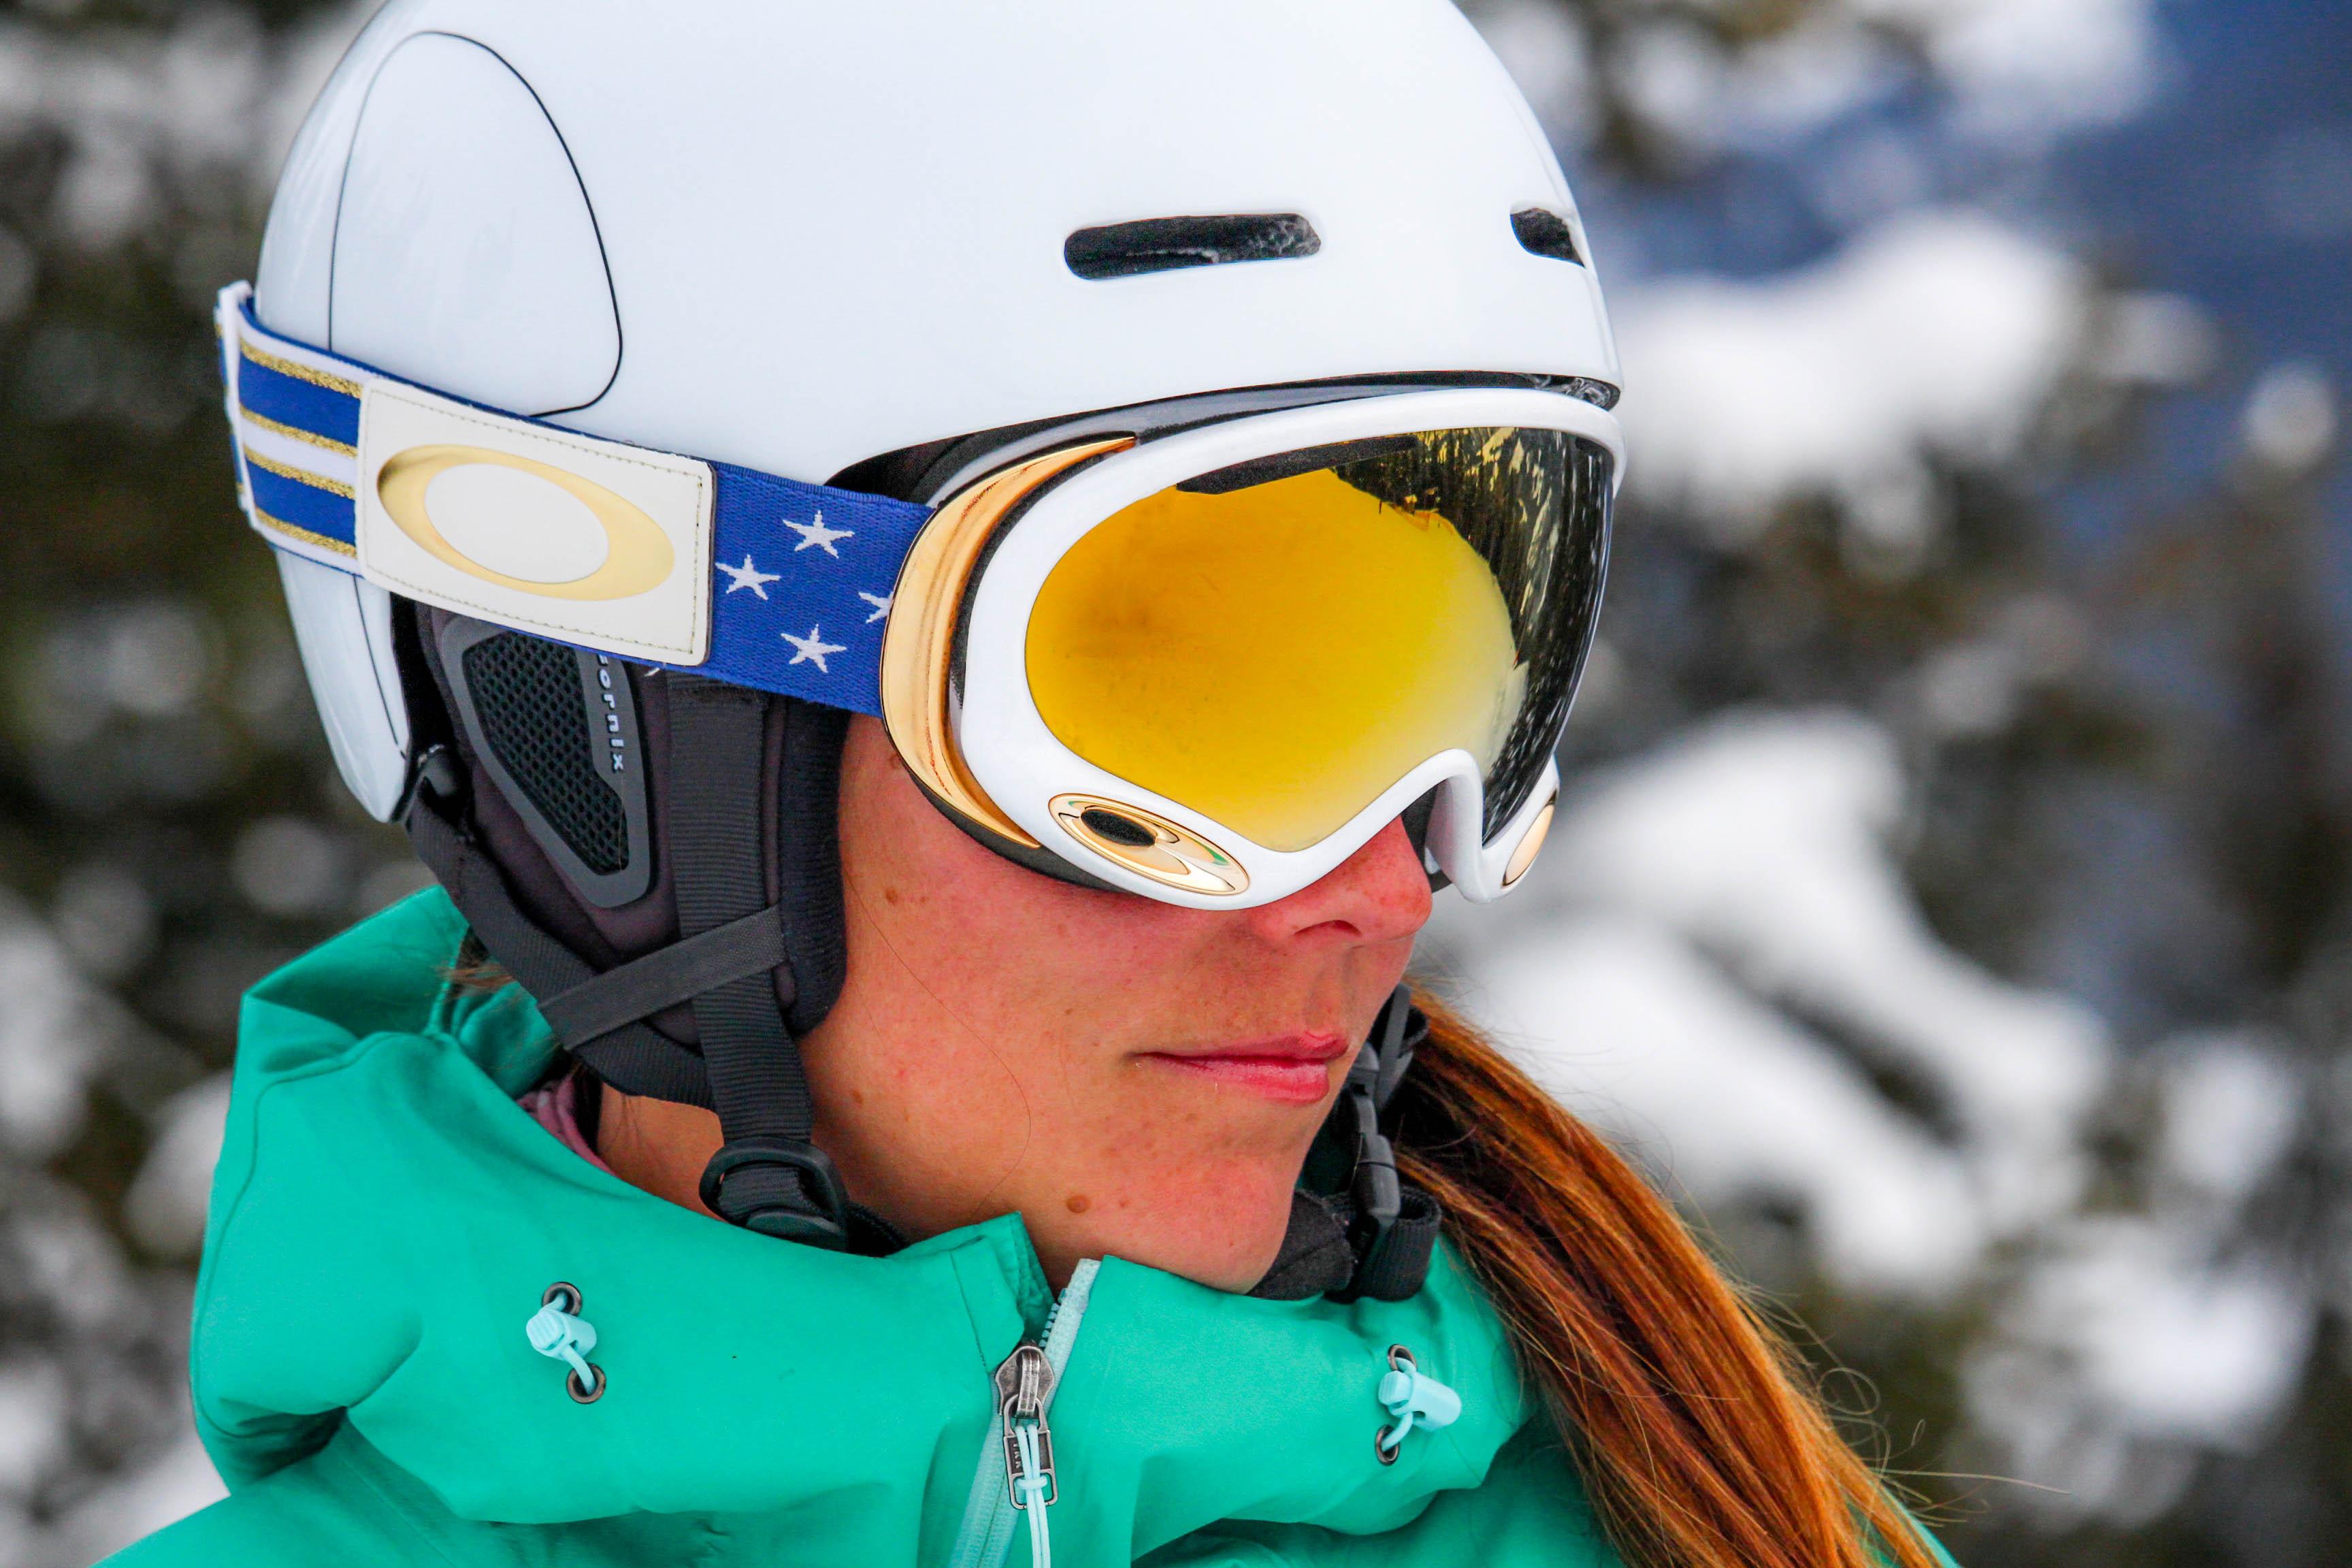 beste sneakers verkoopt groothandel outlet Skibril of helm kopen: hier moet je op letten